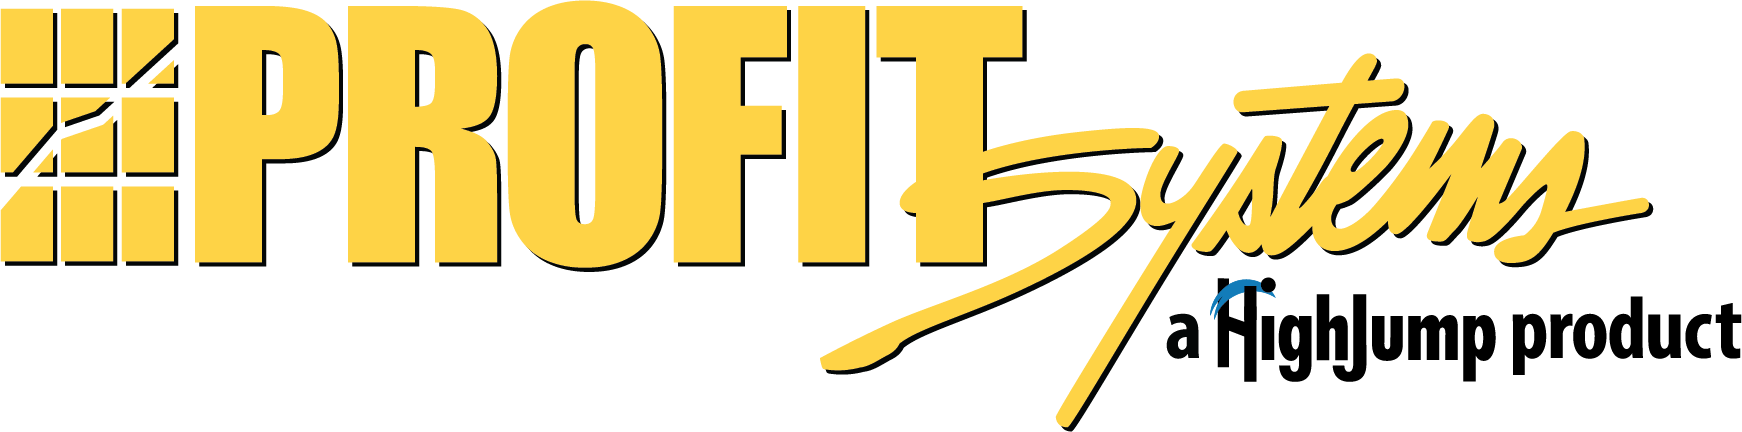 HighJump-Profit-Systems-Logo